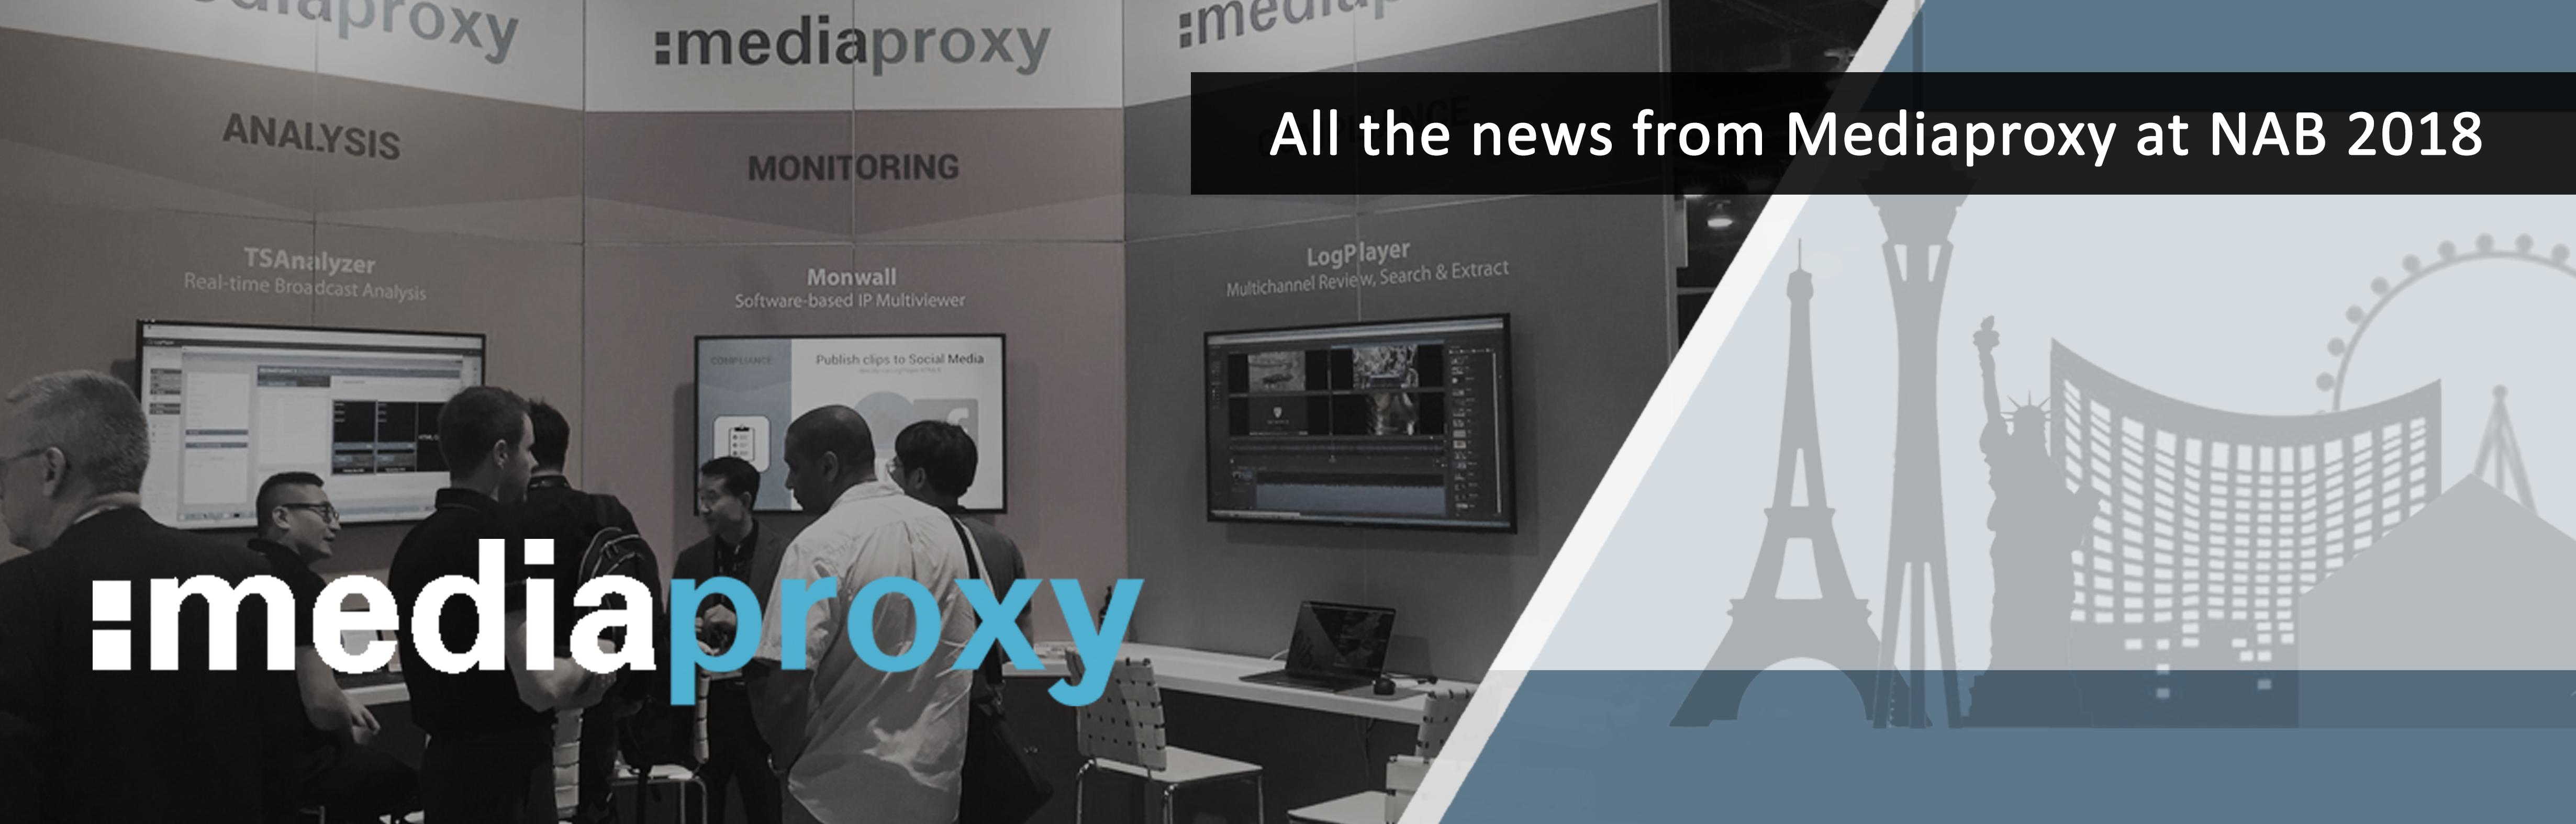 Post NAB 2018 News From Mediaproxy_Header